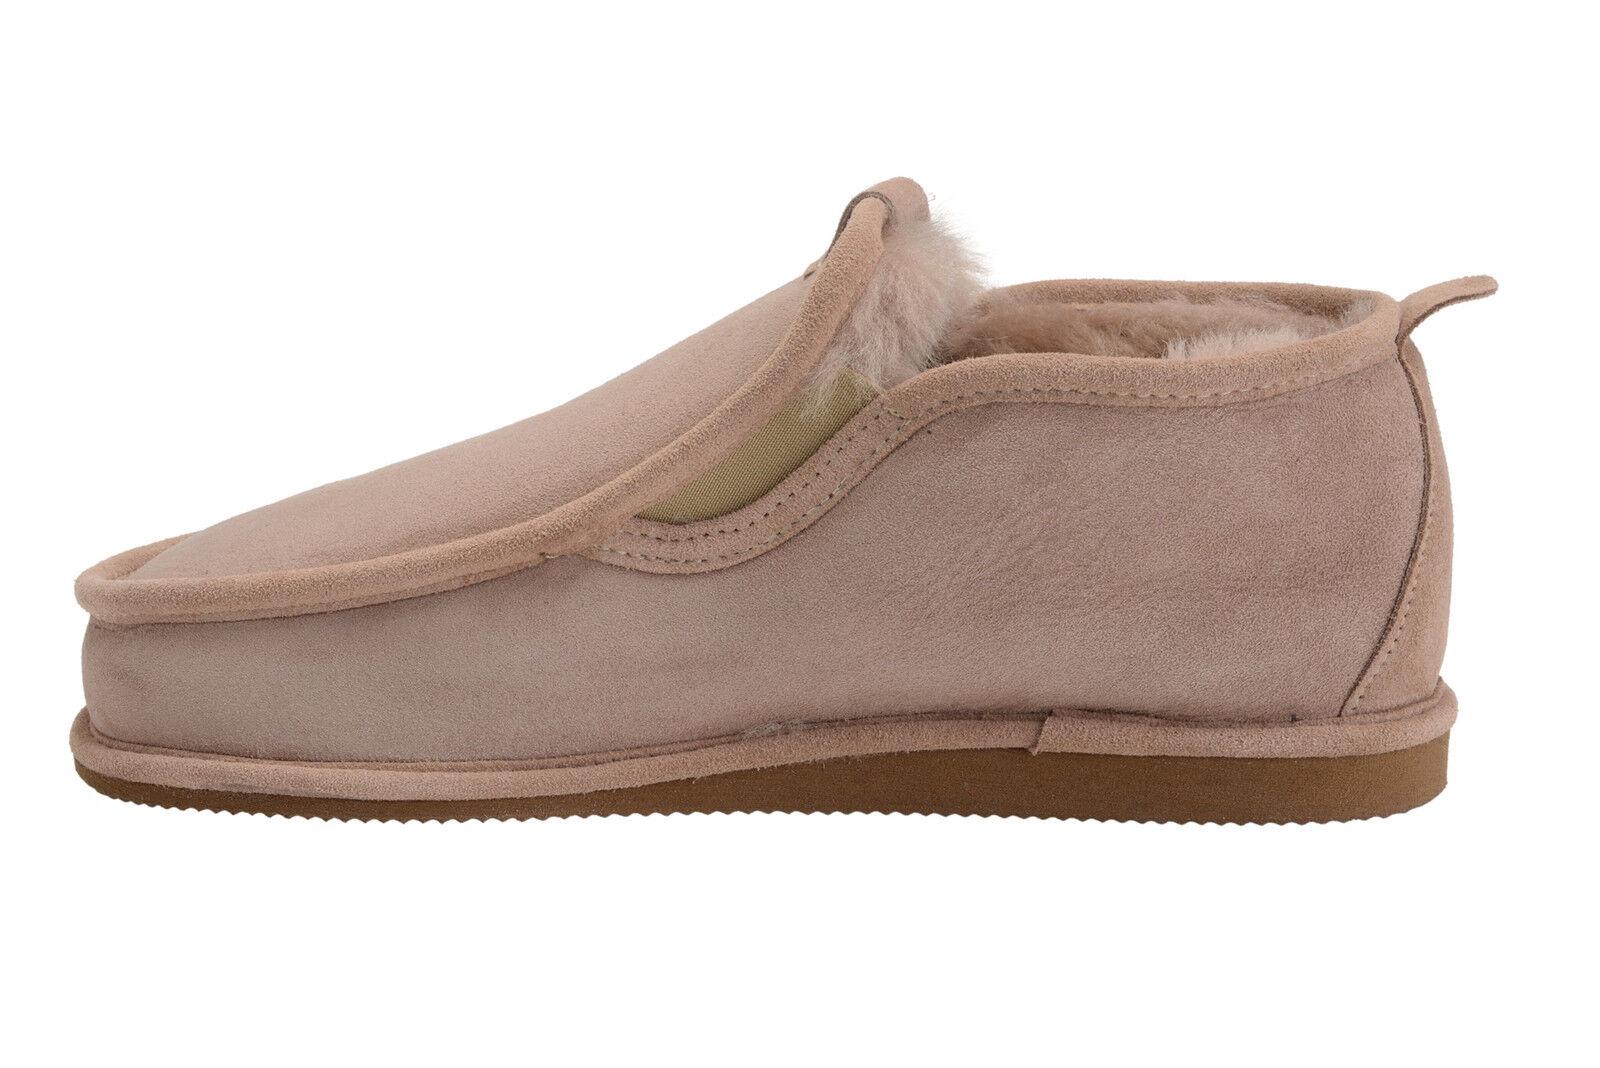 New  Uomo House Sheepskin Moccasin Slippers with Warm Sz Real Wool Lining UK Sz Warm 7-10 e029c7